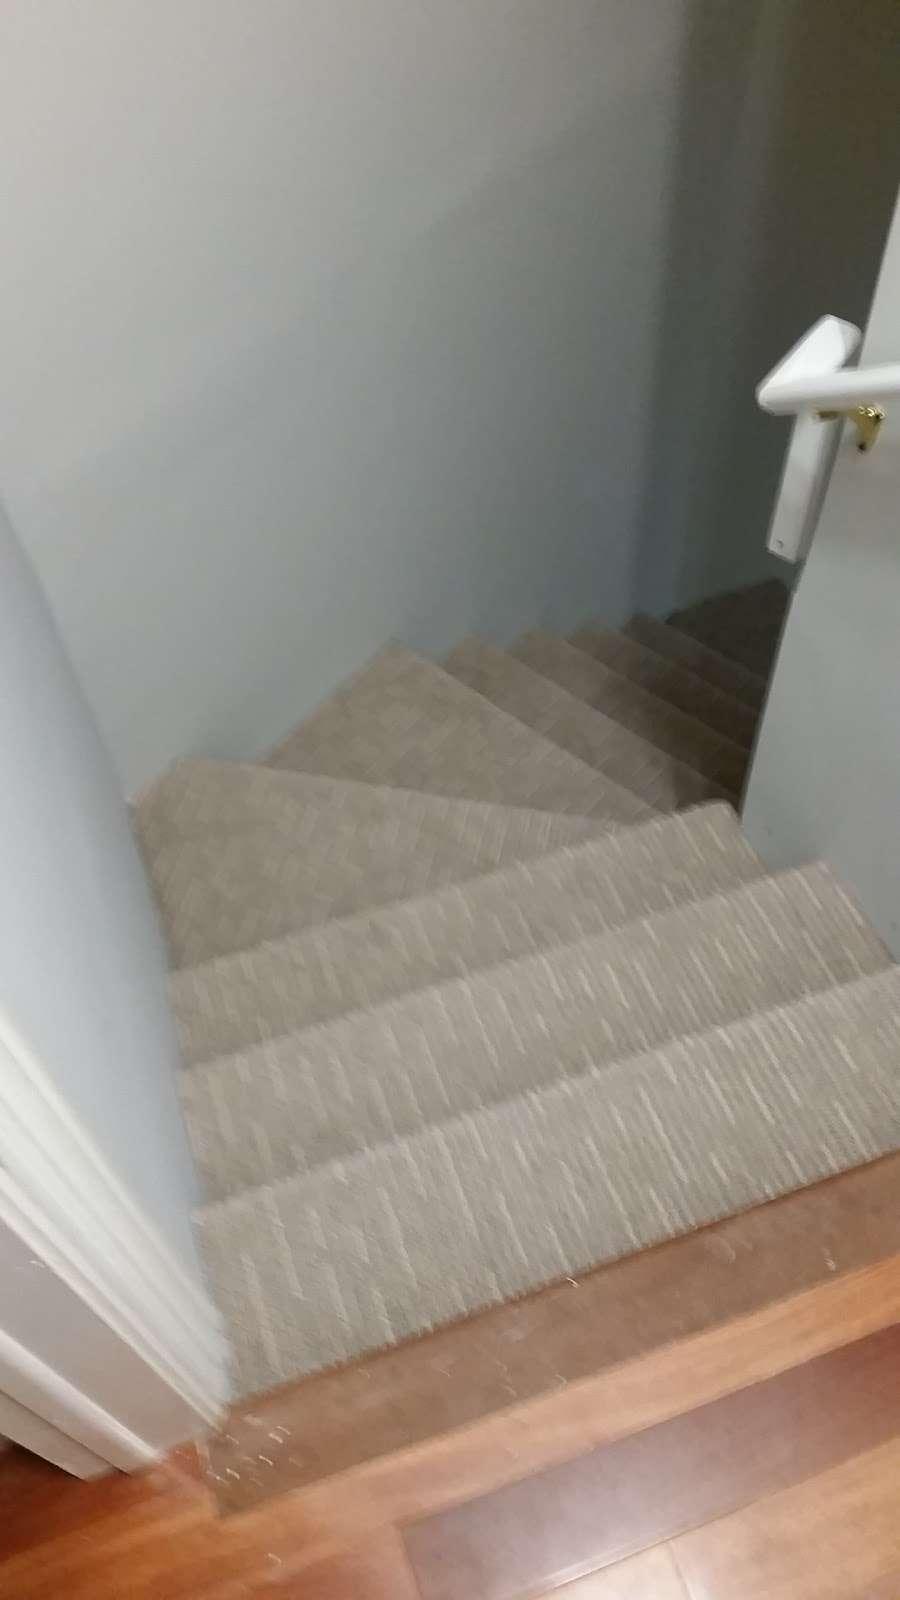 Godfrey Family Carpets - laundry    Photo 5 of 10   Address: 380 Daniel Webster Hwy, Merrimack, NH 03054, USA   Phone: (603) 647-0700